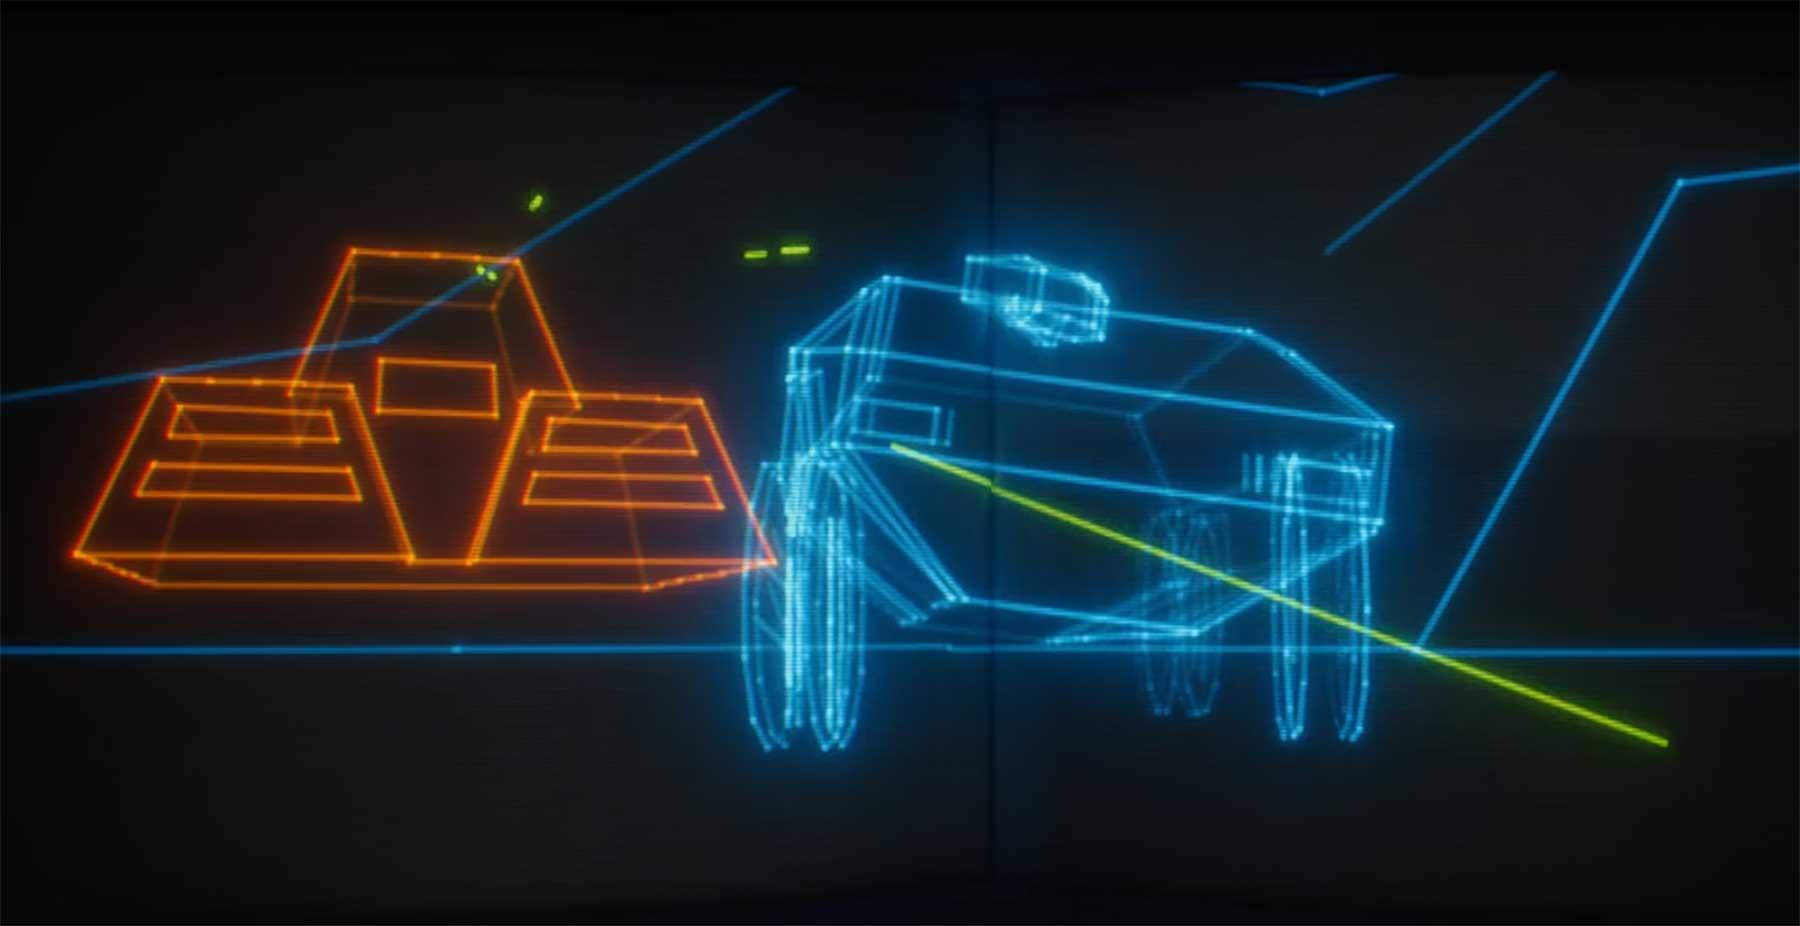 Vektor-Kurzfilm im Retro-Gaming-Stil: TANK